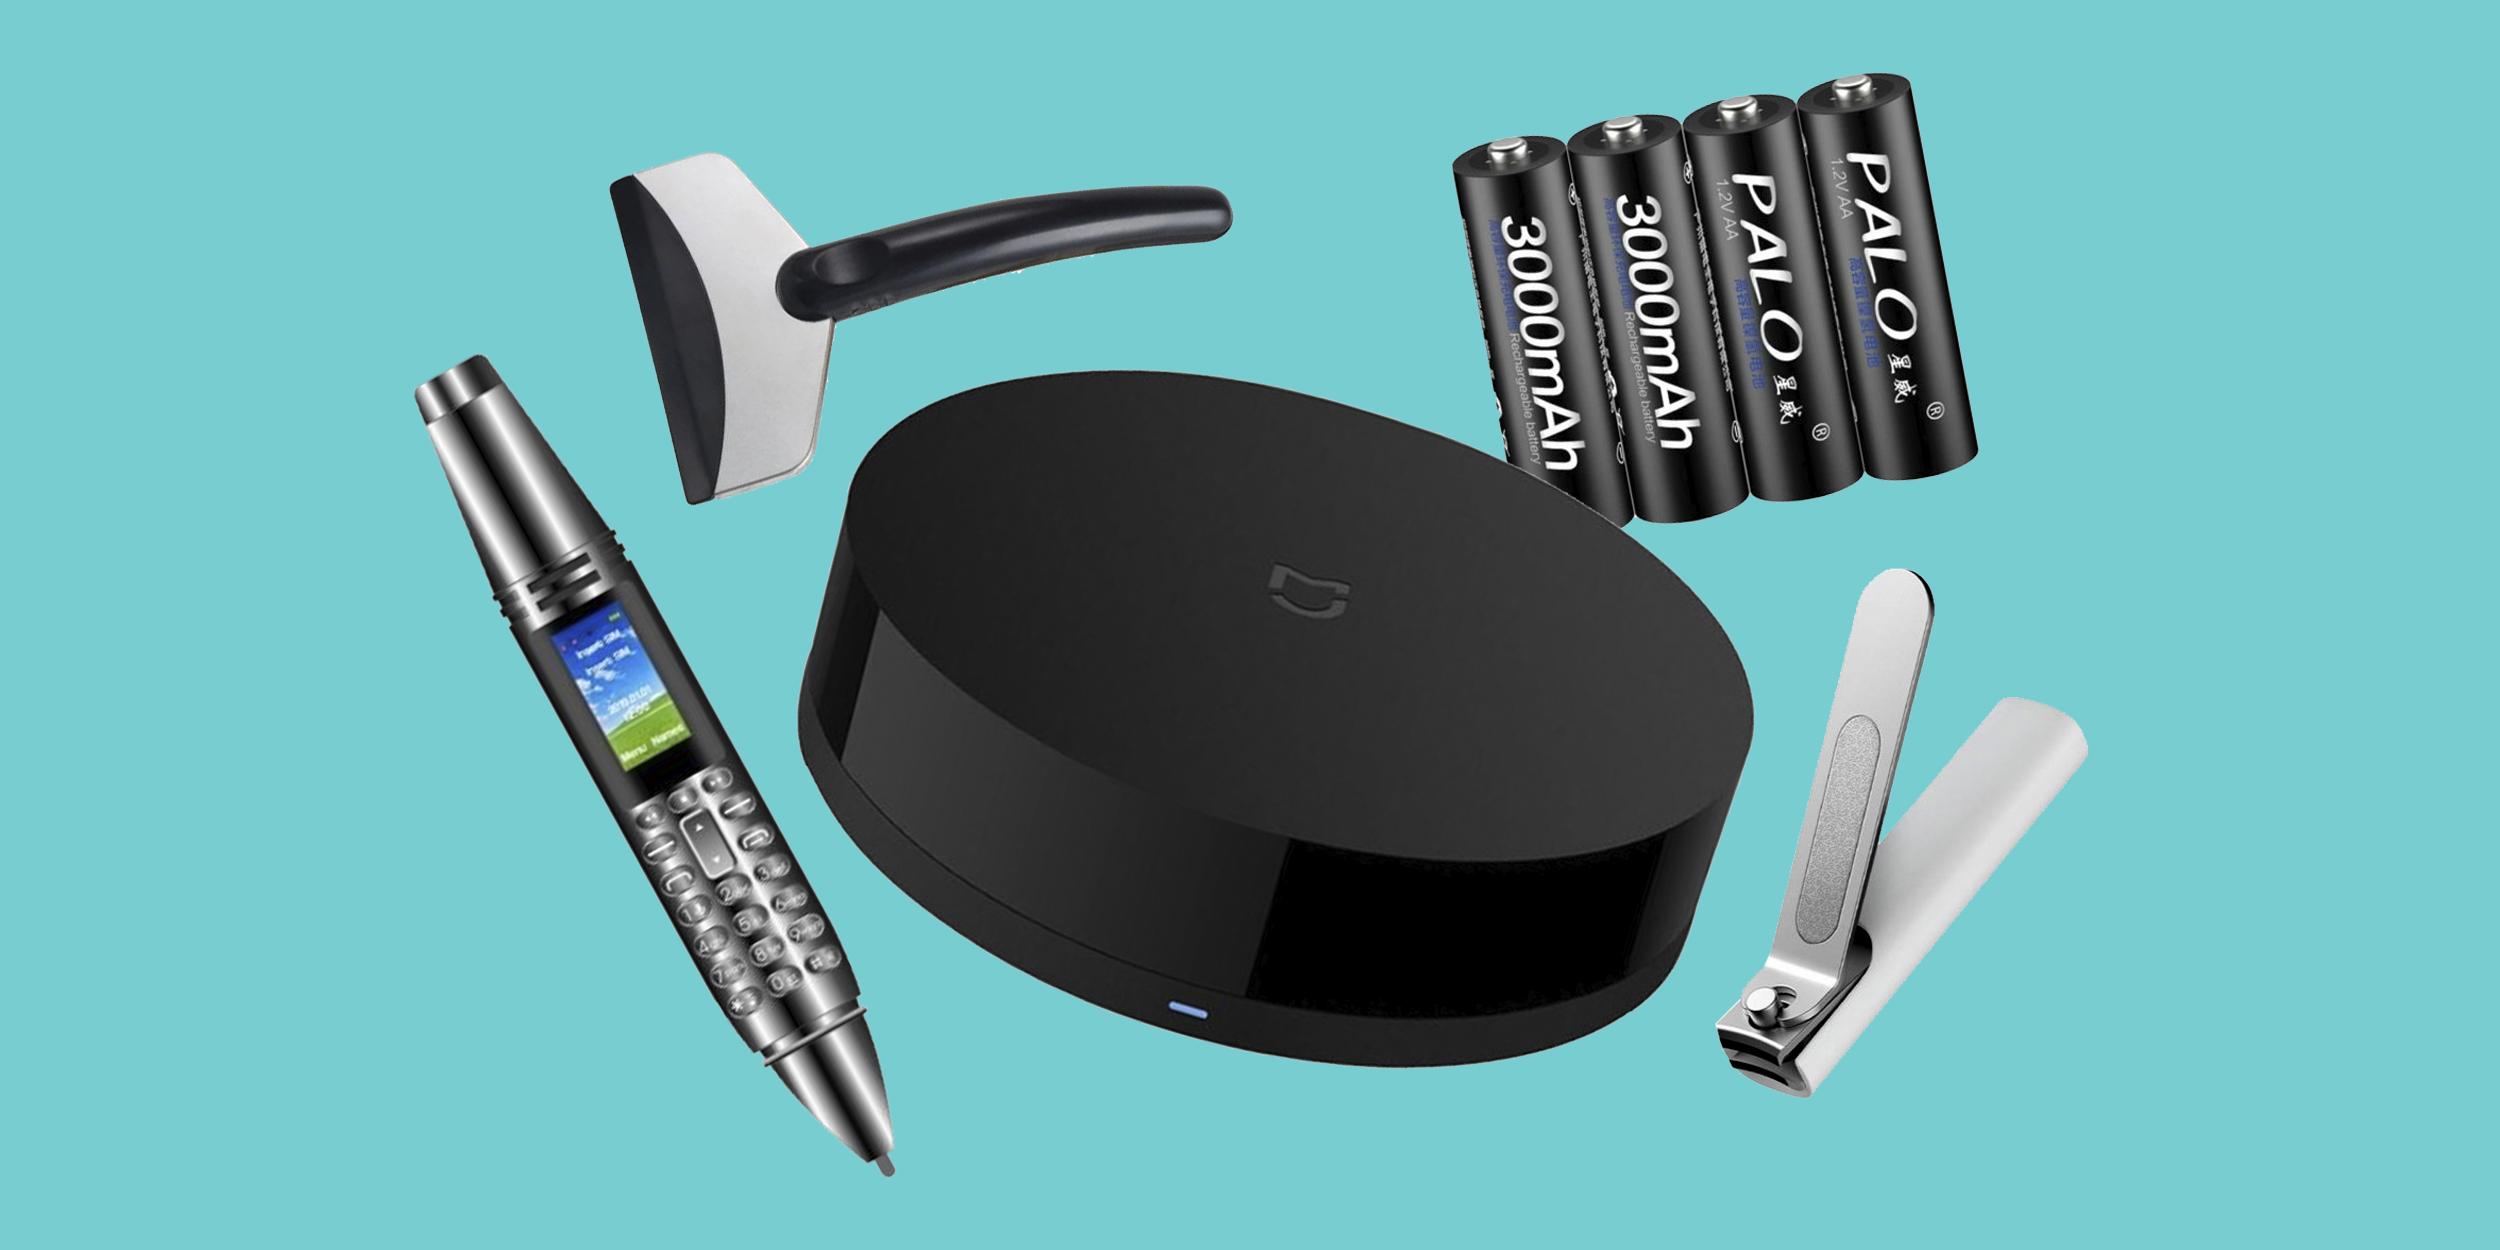 Находки AliExpress: аккумуляторные батарейки, ручка-смартфон, очки Морфеуса